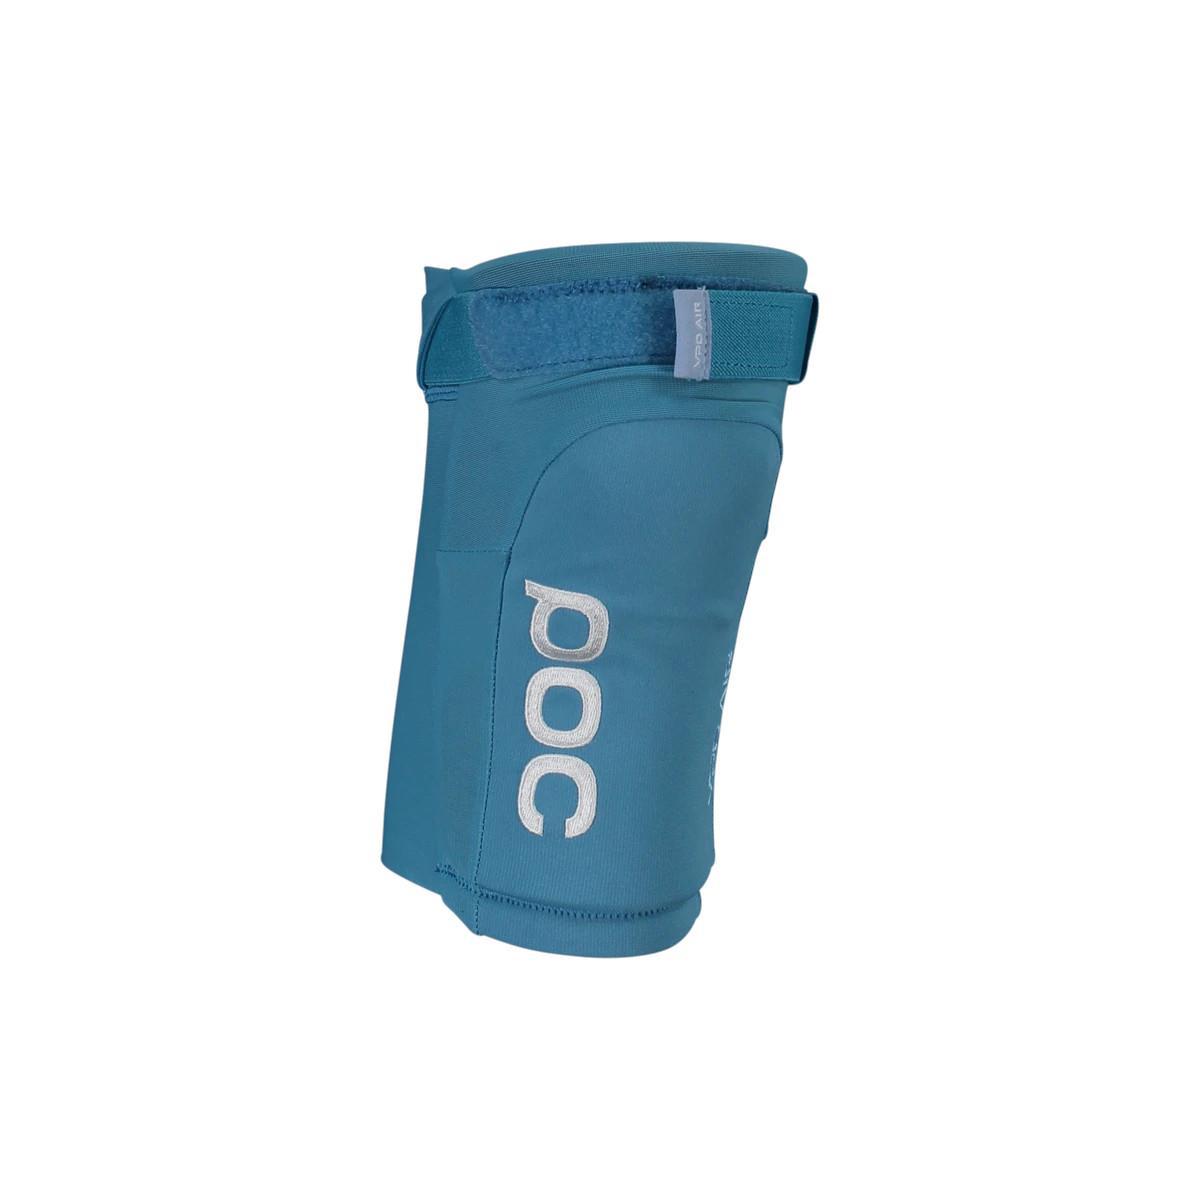 Joint VPD Air Knee Protectors Basalt Blue Size XS